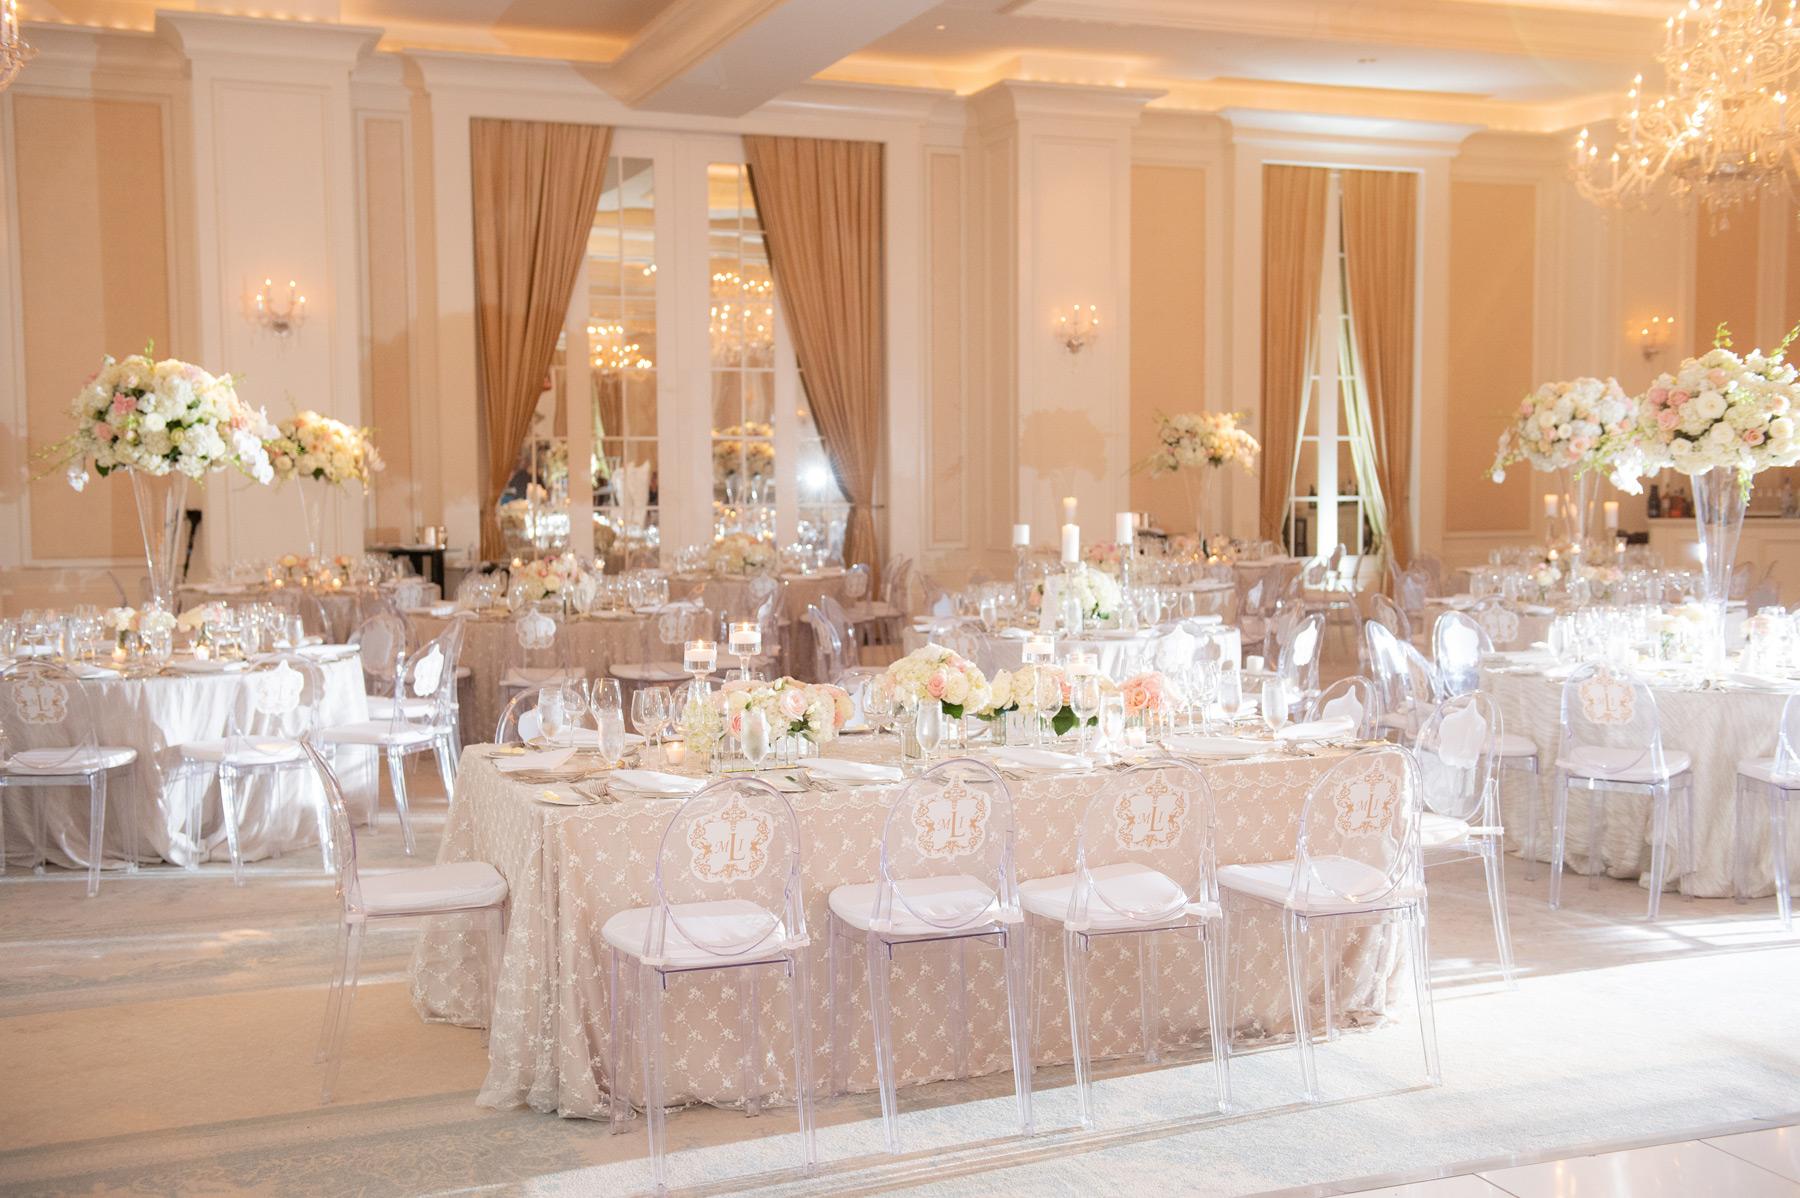 St-Regis-Wedding-Atlanta-0914-0063